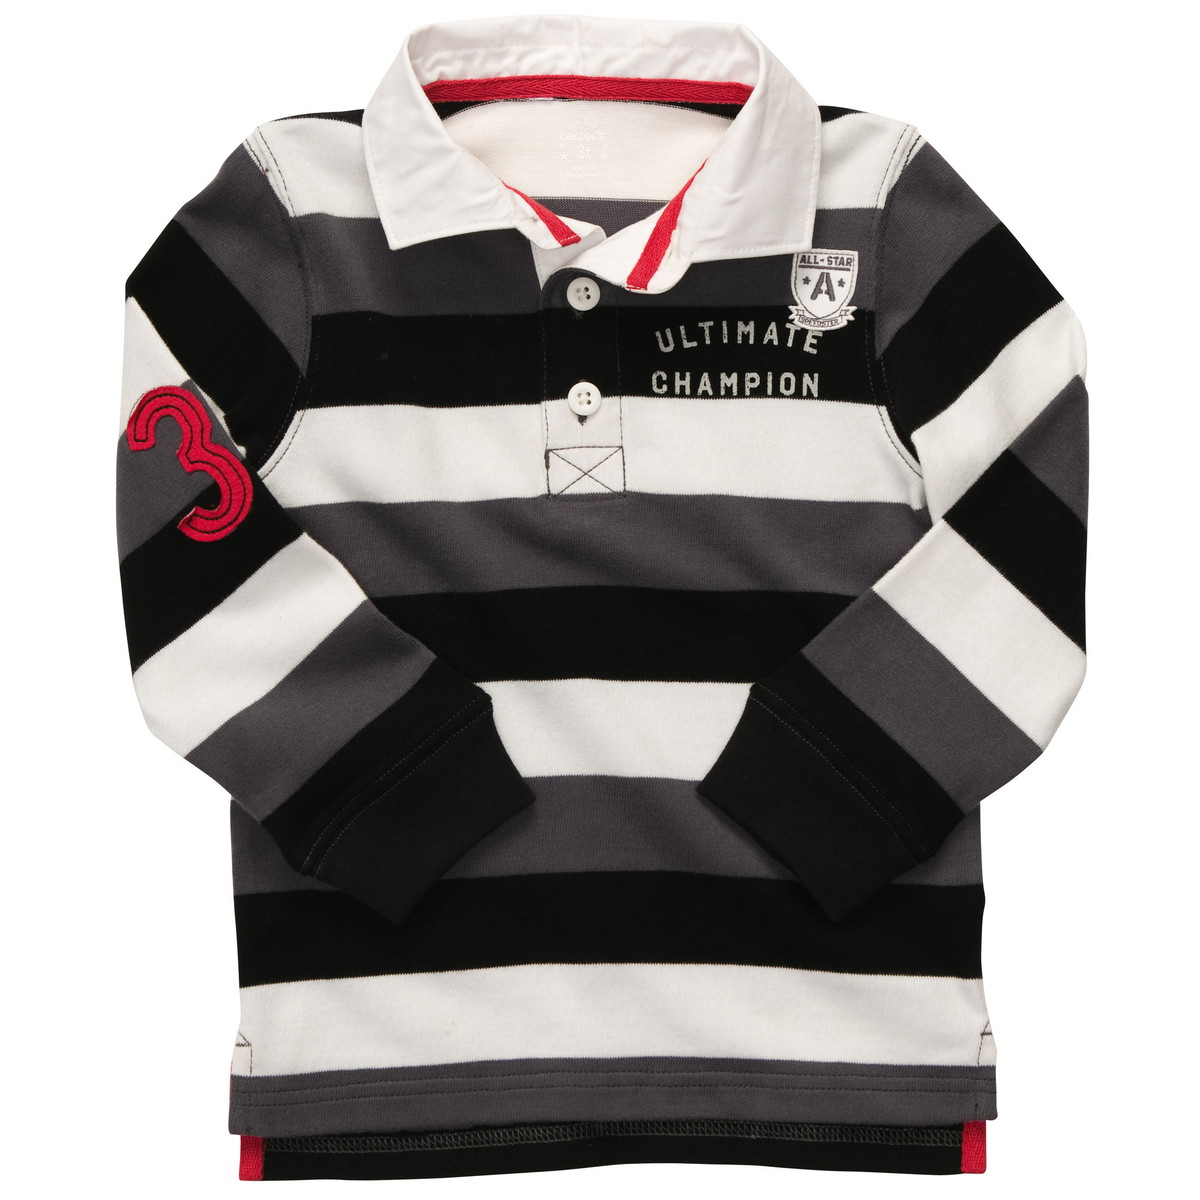 Início > Roupas > Blusa > Blusa Rugby